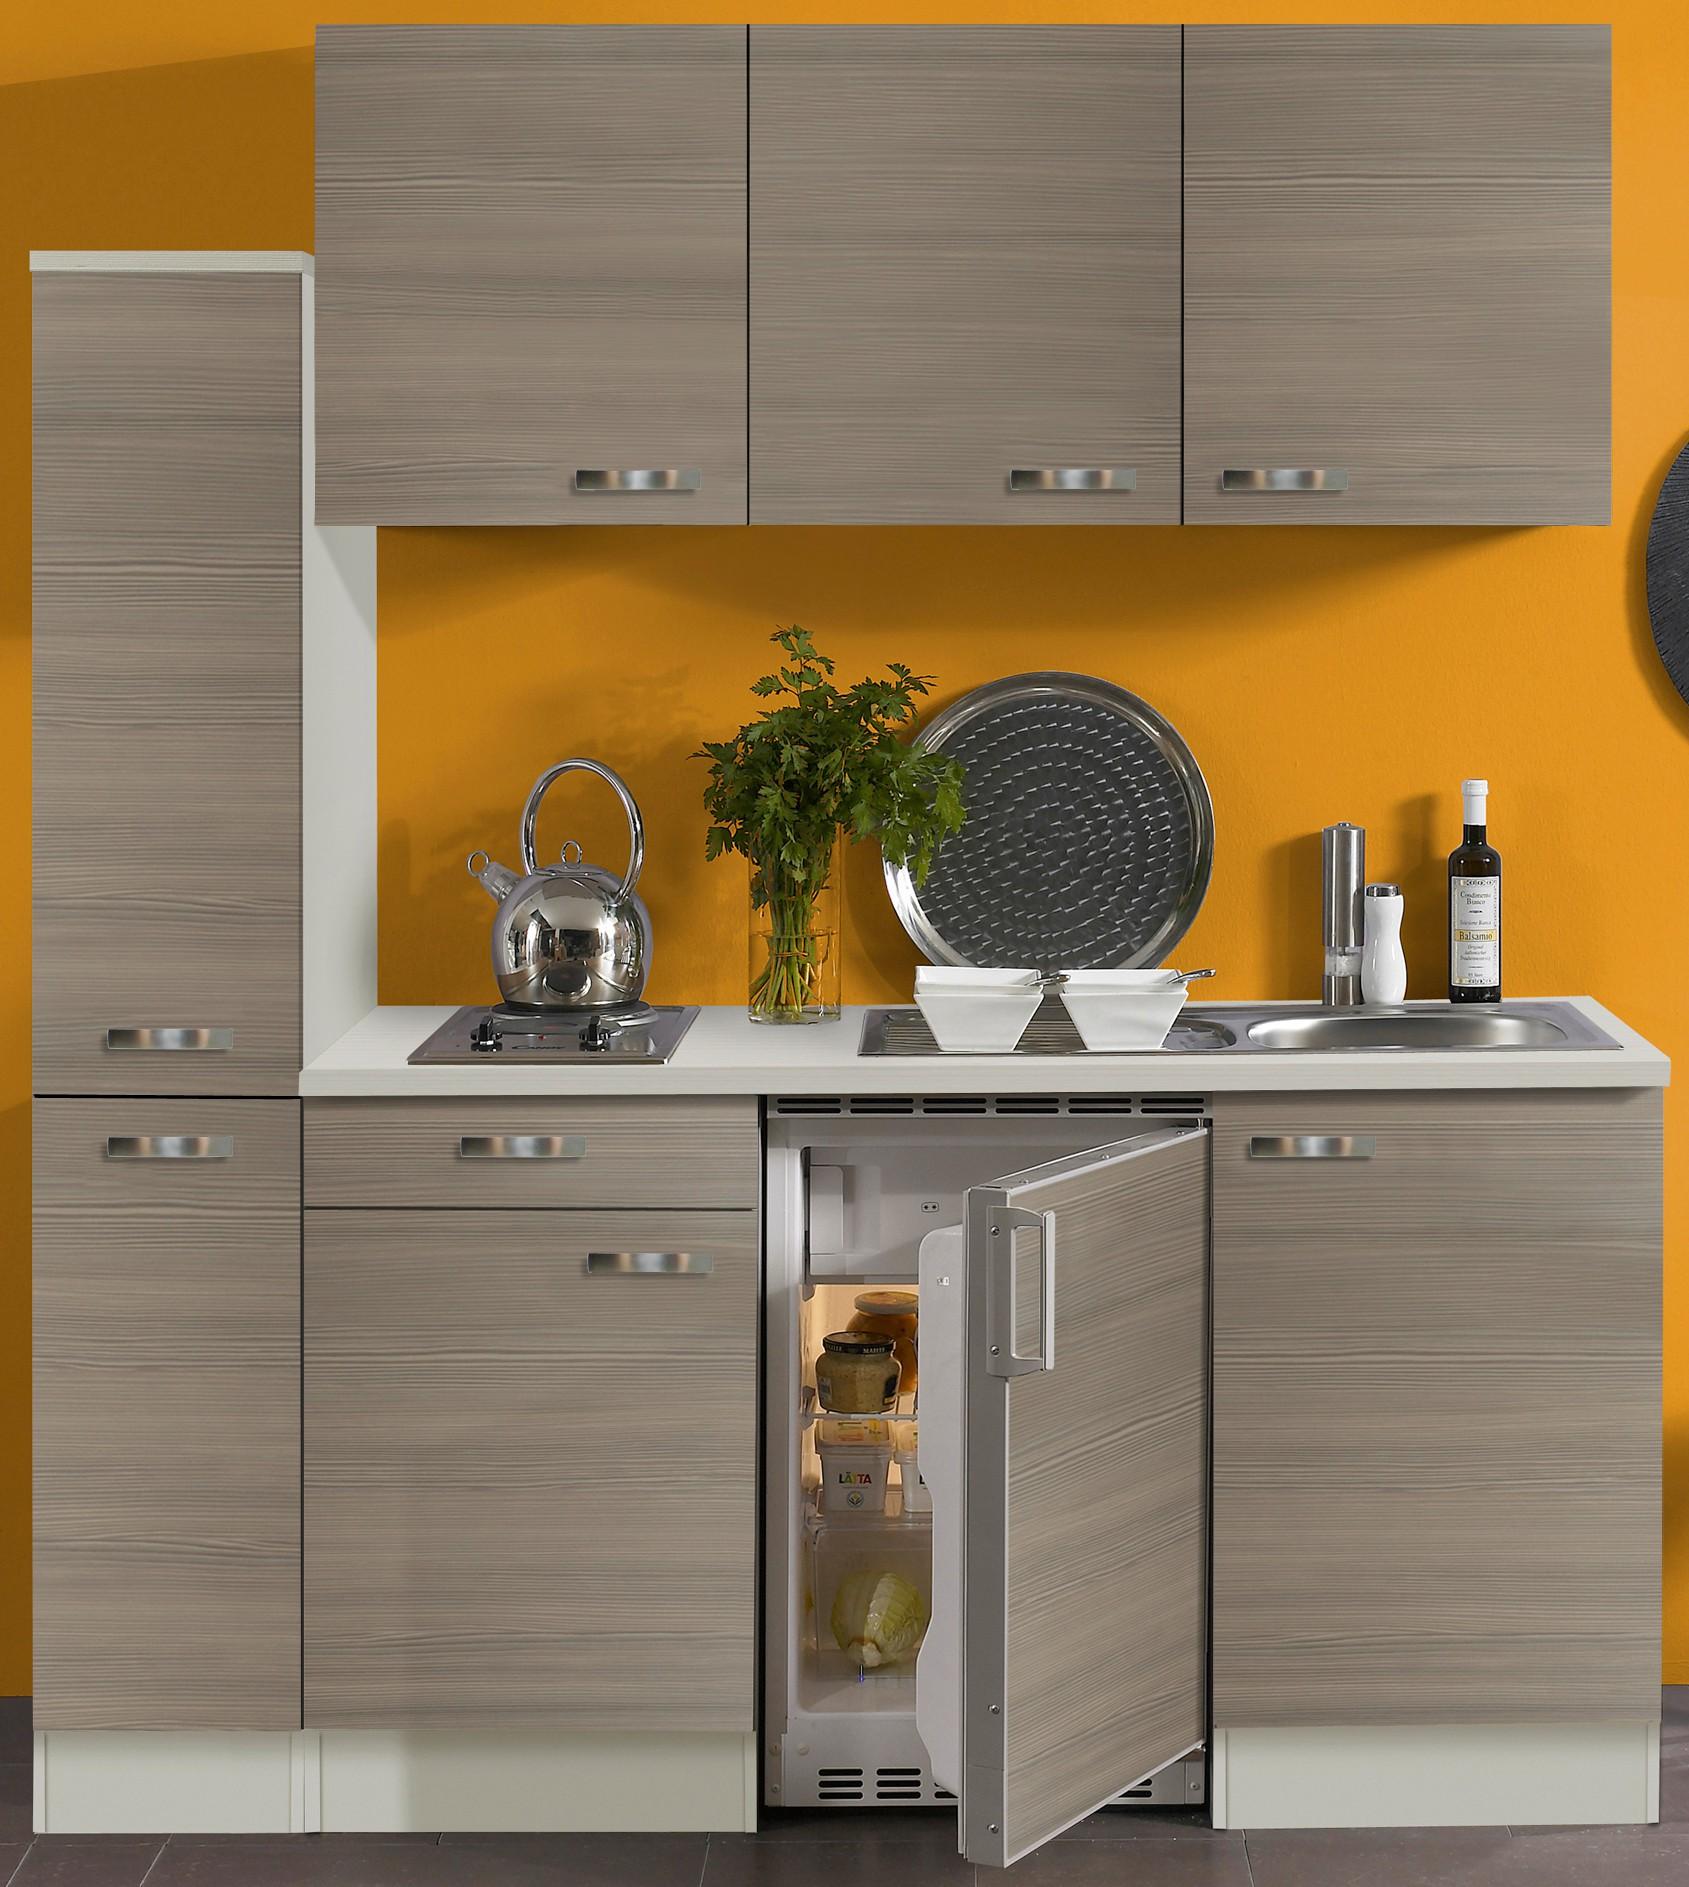 singlek che toledo mit elektro kochfeld 9 teilig breite 180 cm pinie k che singlek chen. Black Bedroom Furniture Sets. Home Design Ideas